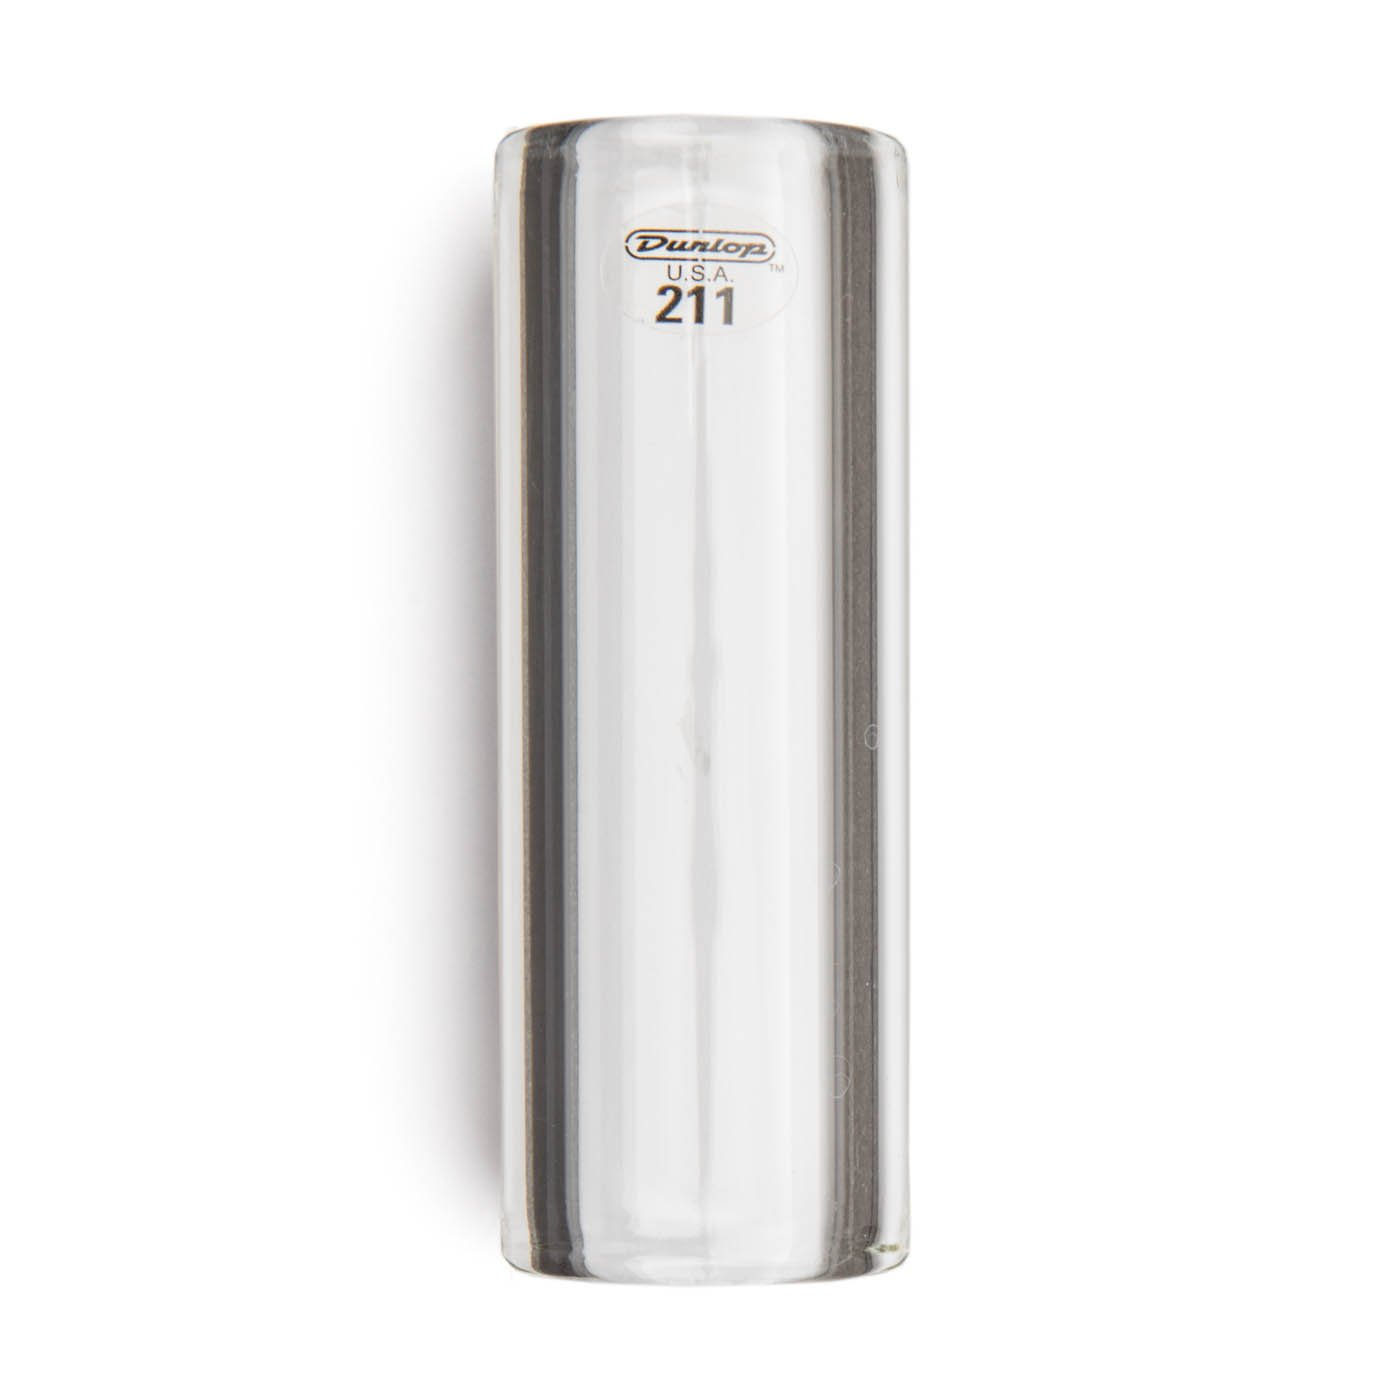 Dunlop 211 Glass Slide Size 7